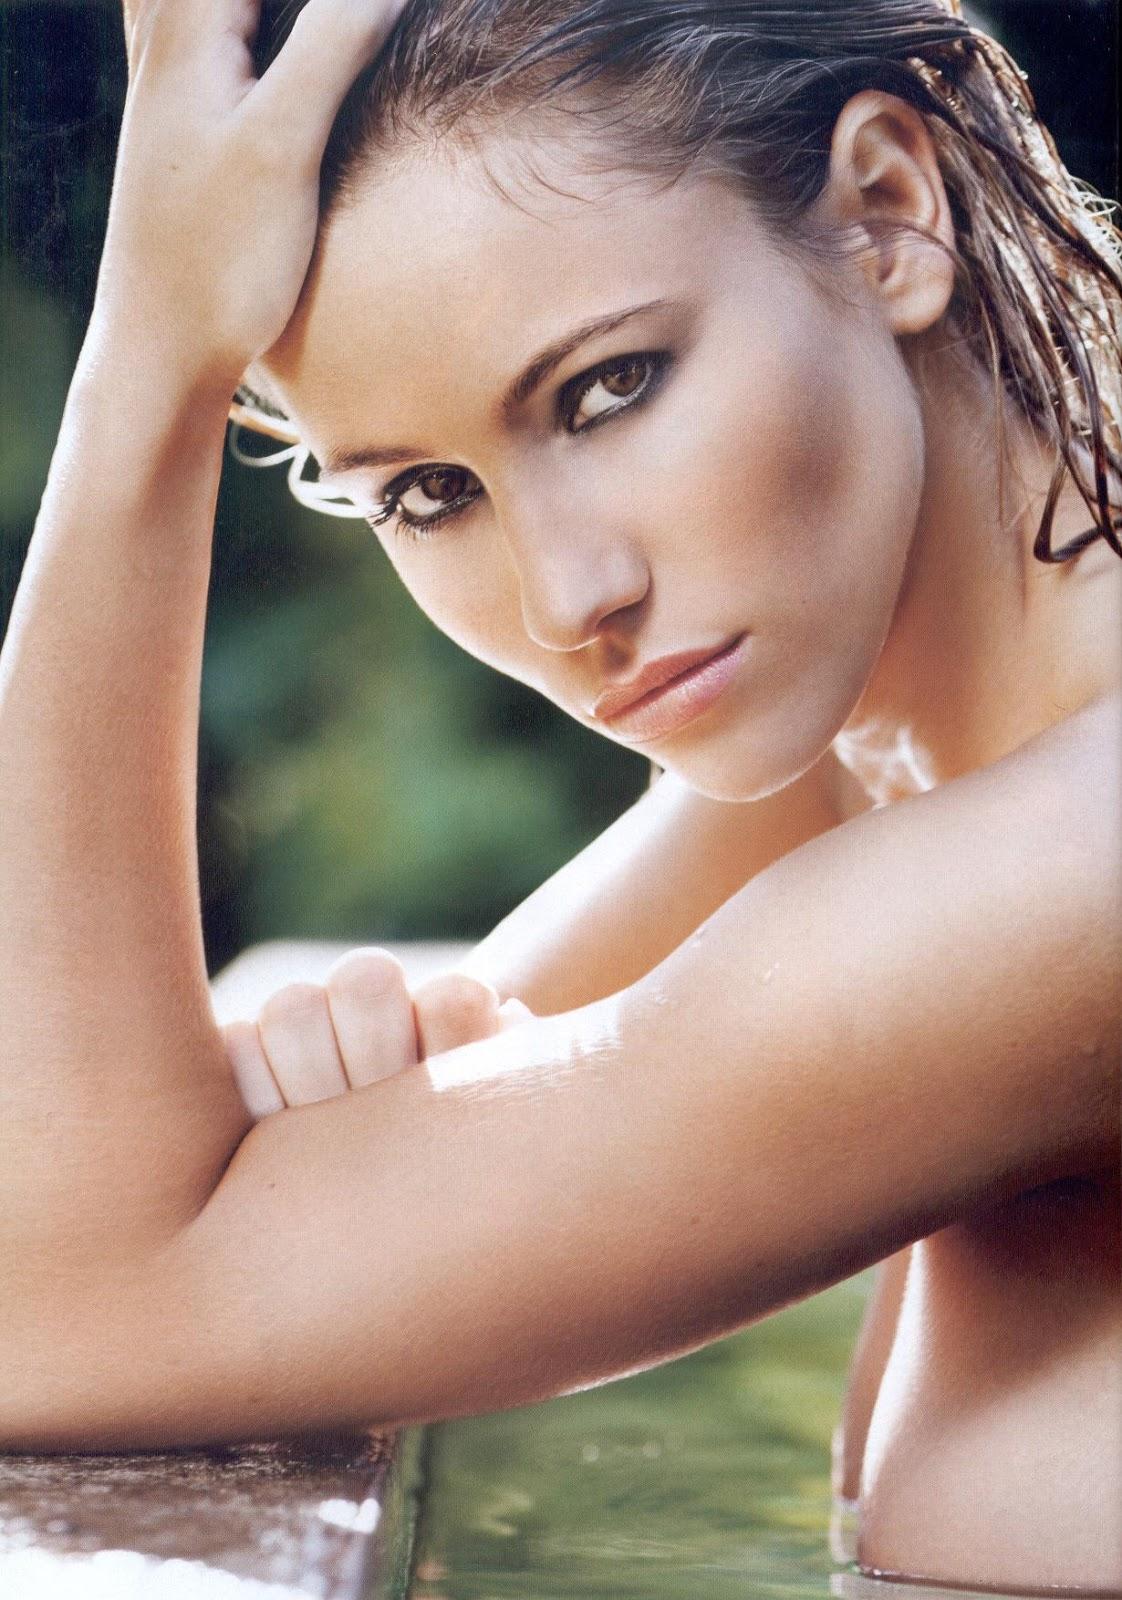 Amateur bbw milf kimmie sexting nude pics